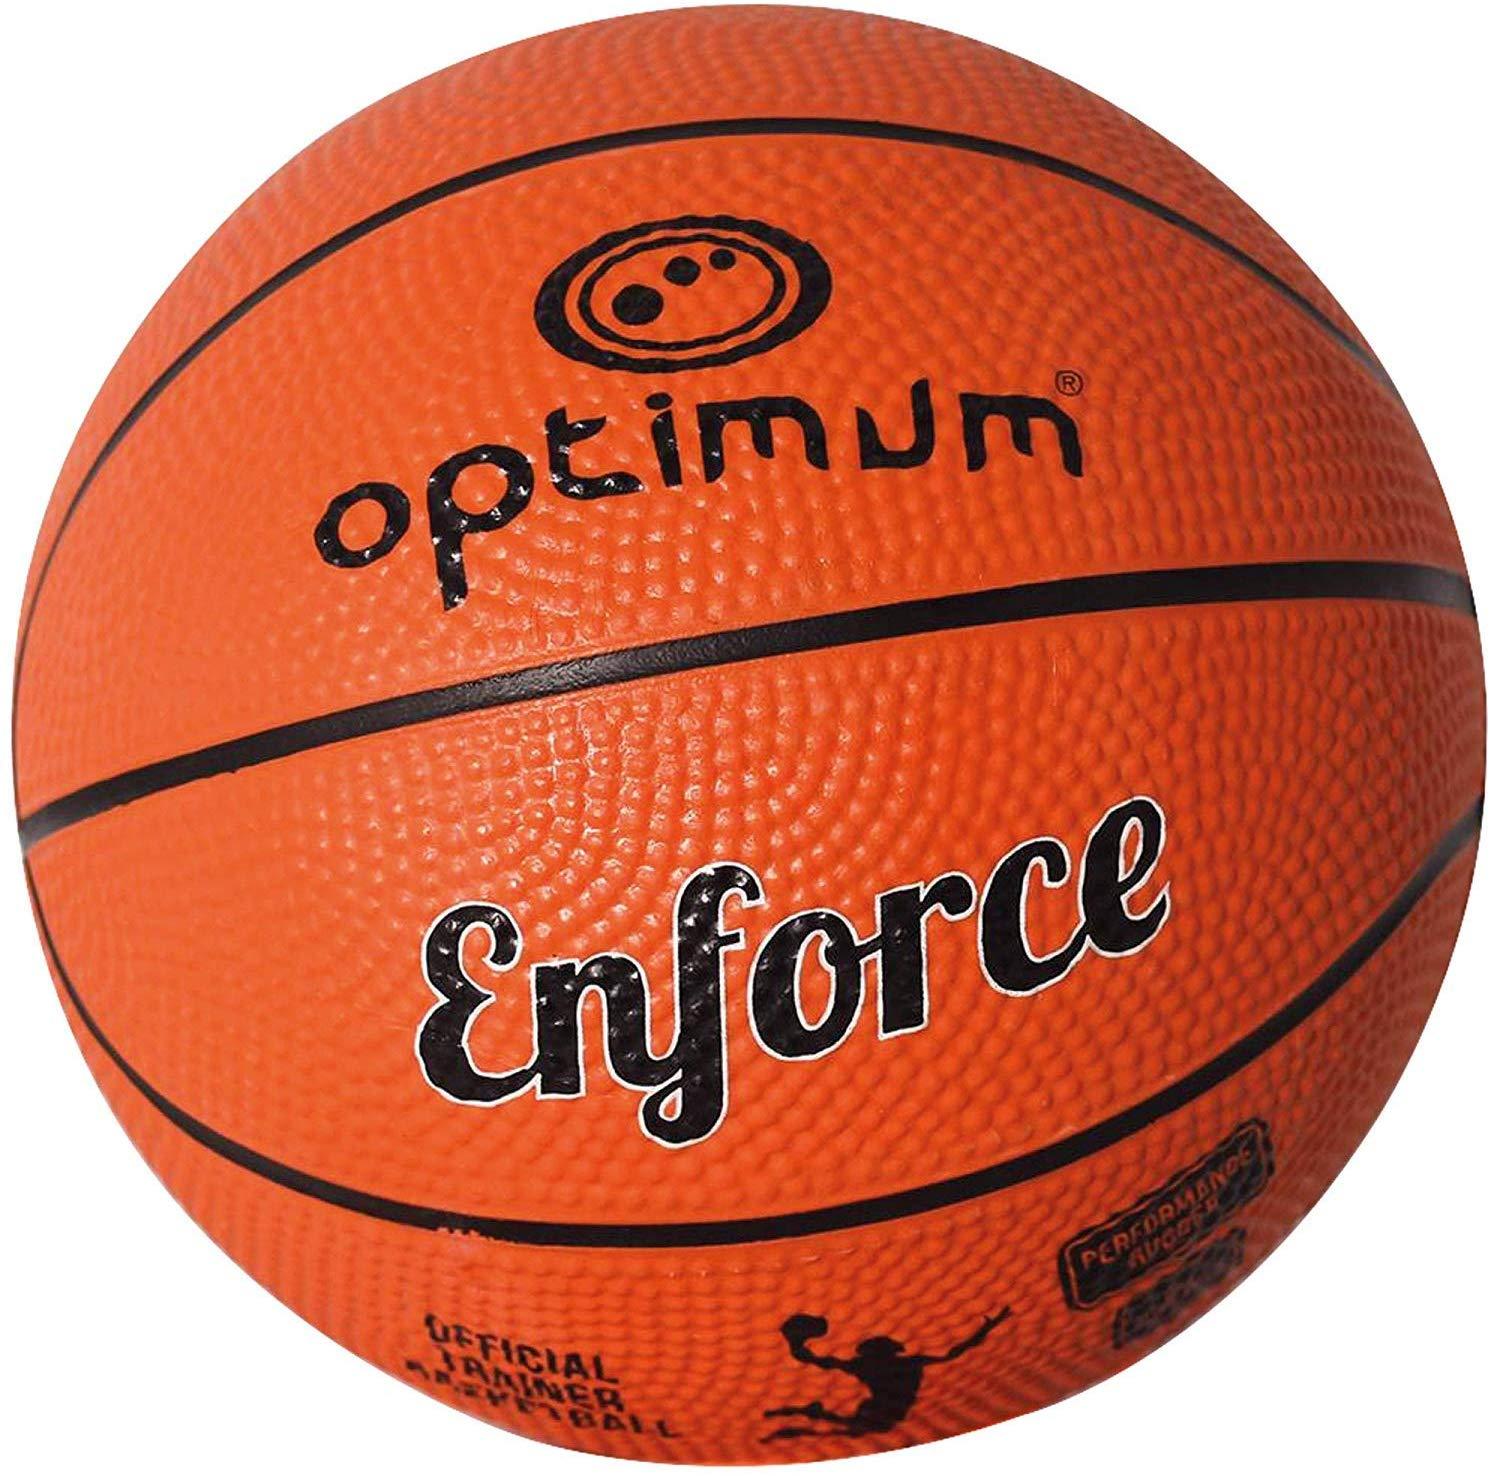 Optimum Enforce Palla da Basket TG 7 adulti (74-76 cm)